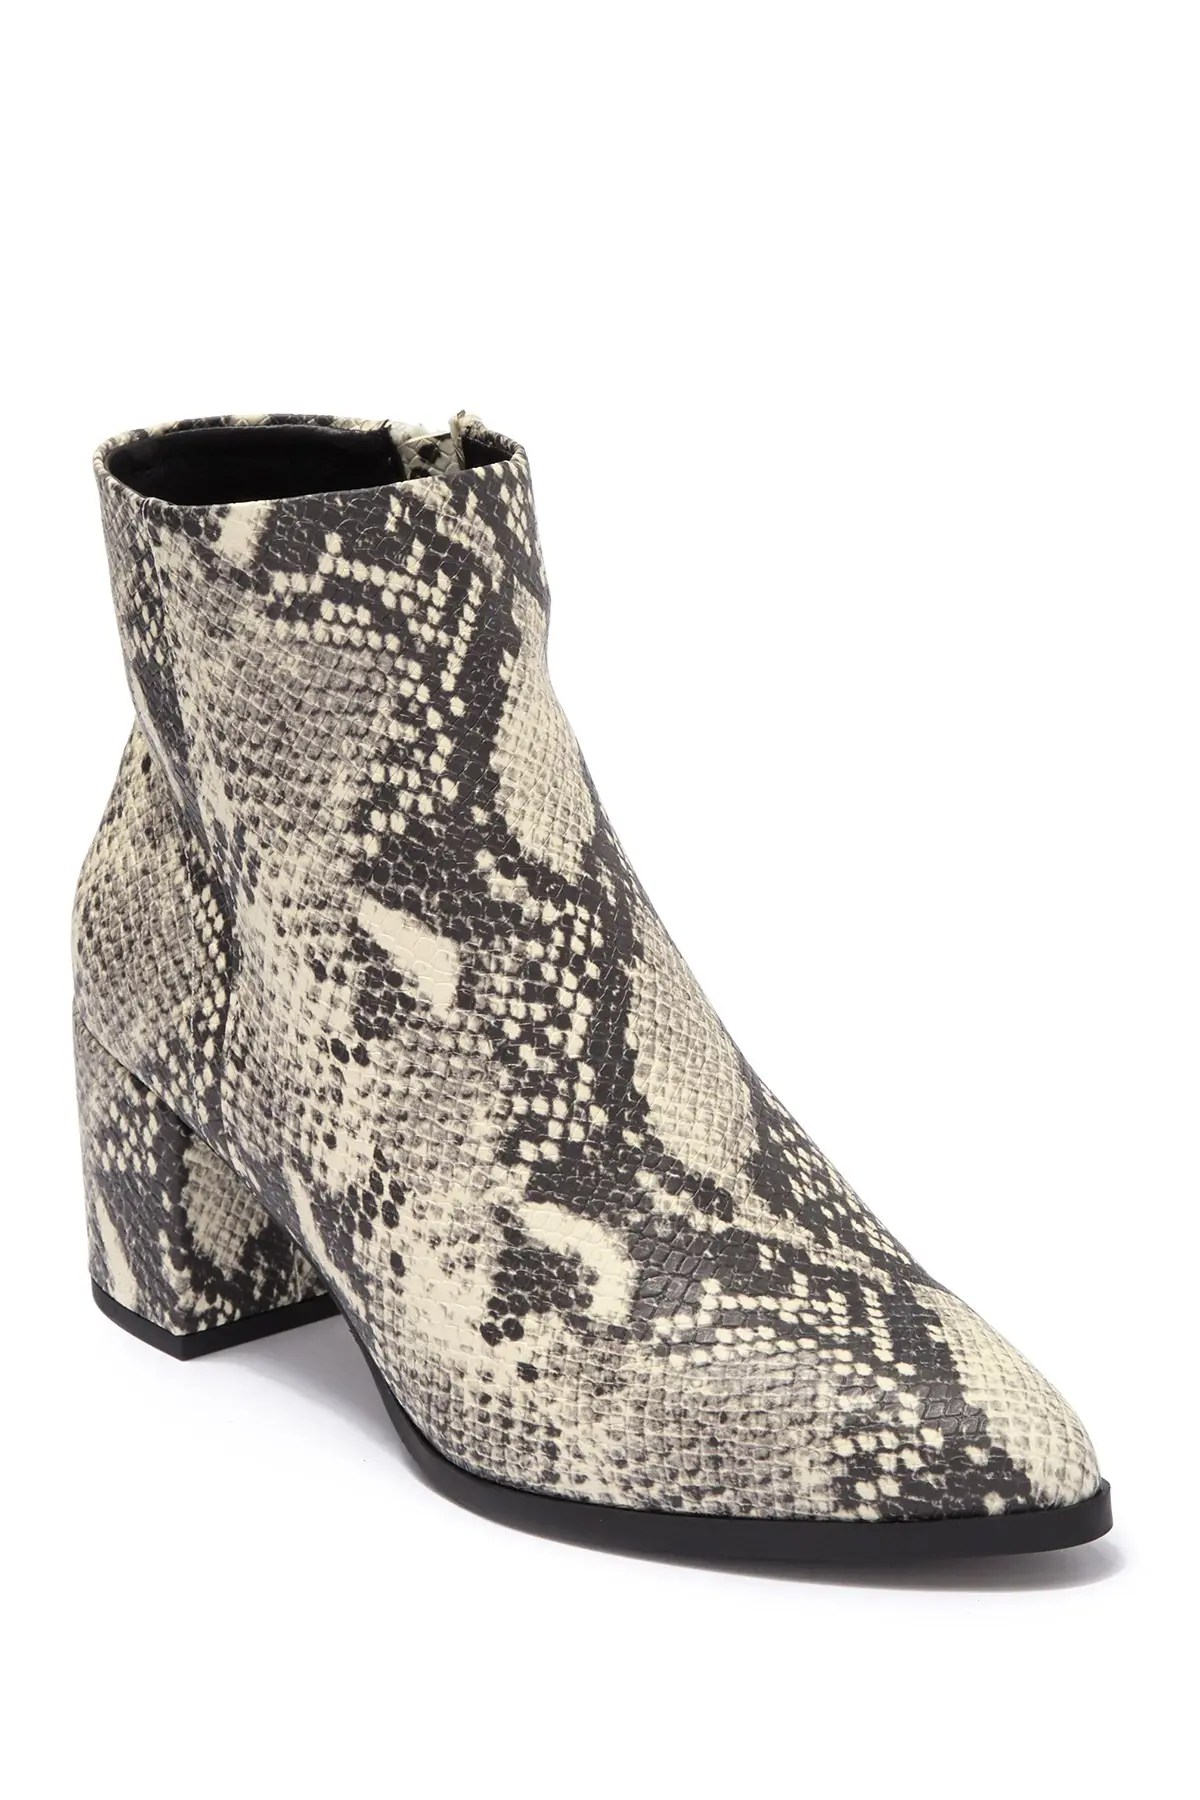 nordstrom rack womens shoes sale online